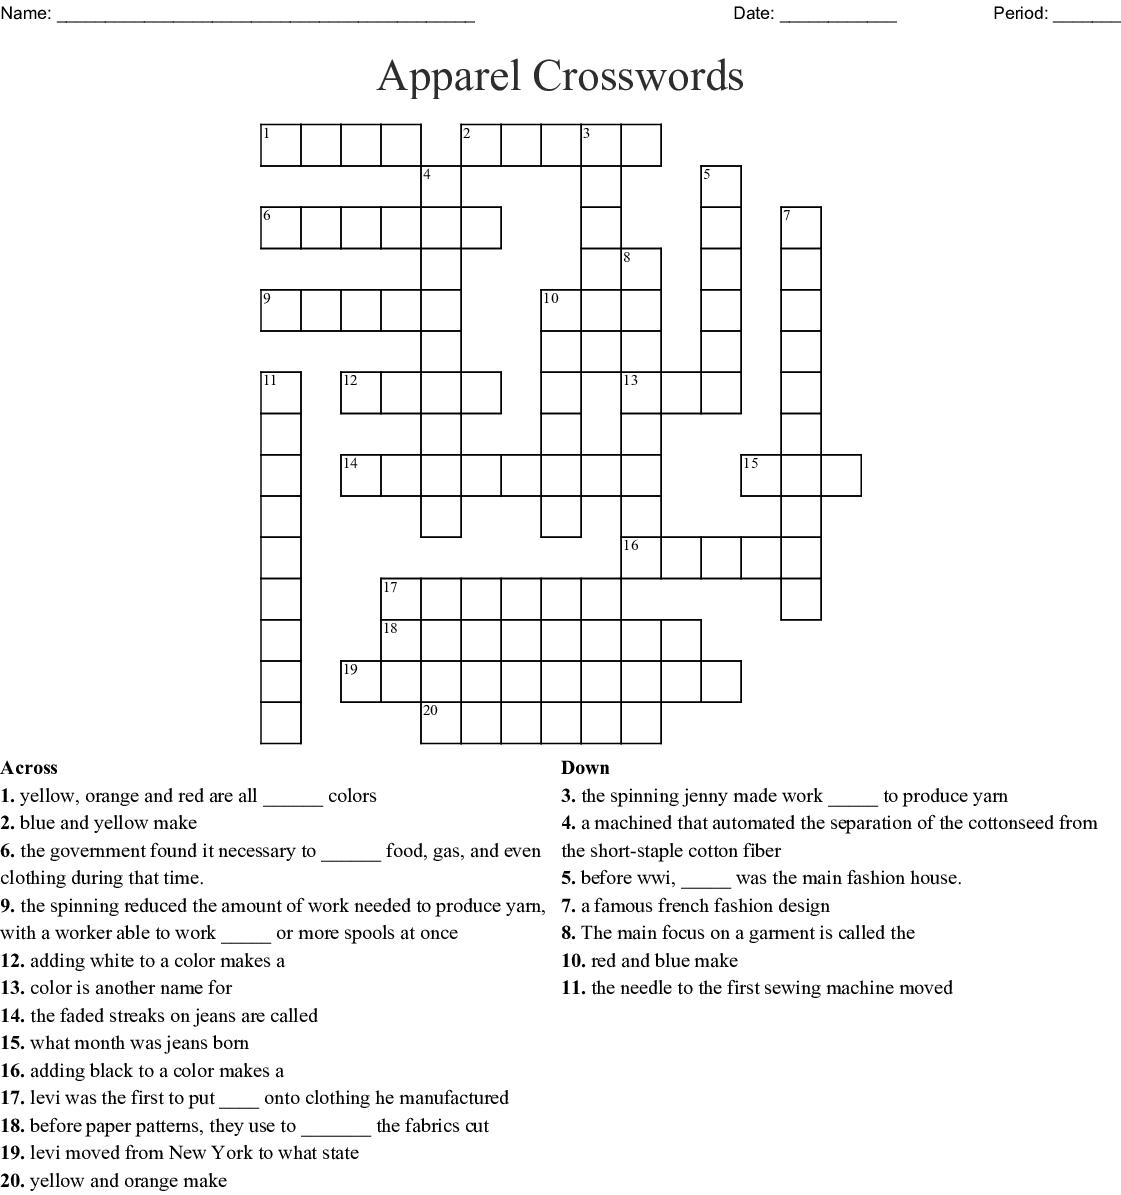 Fashion Design Crossword Wordmint